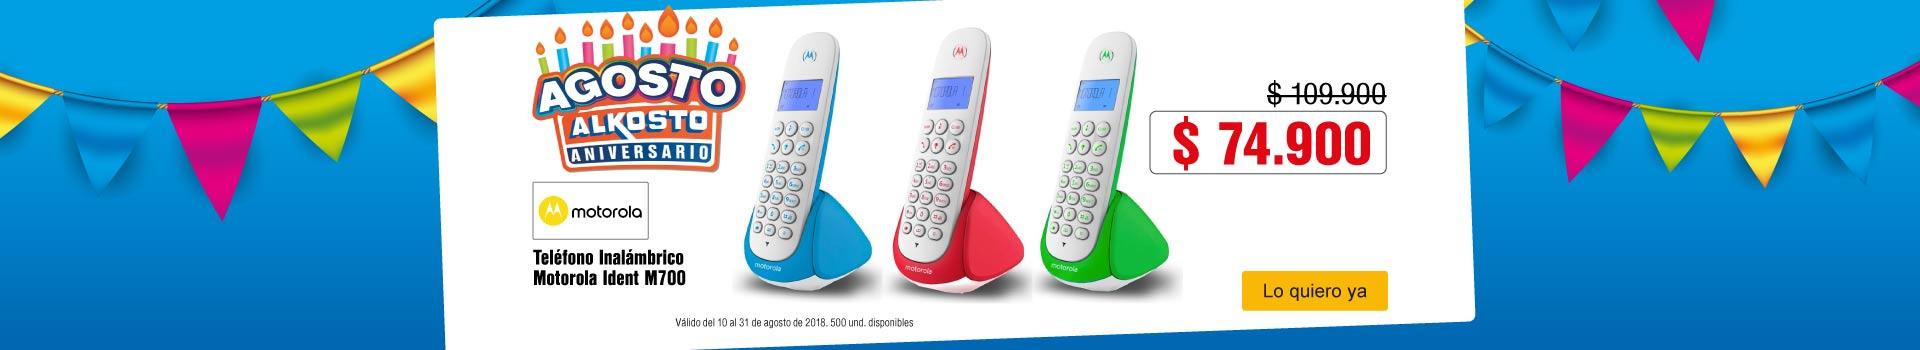 AK-BCAT-1-telfijo-PP---Motorola-M700-Ago10